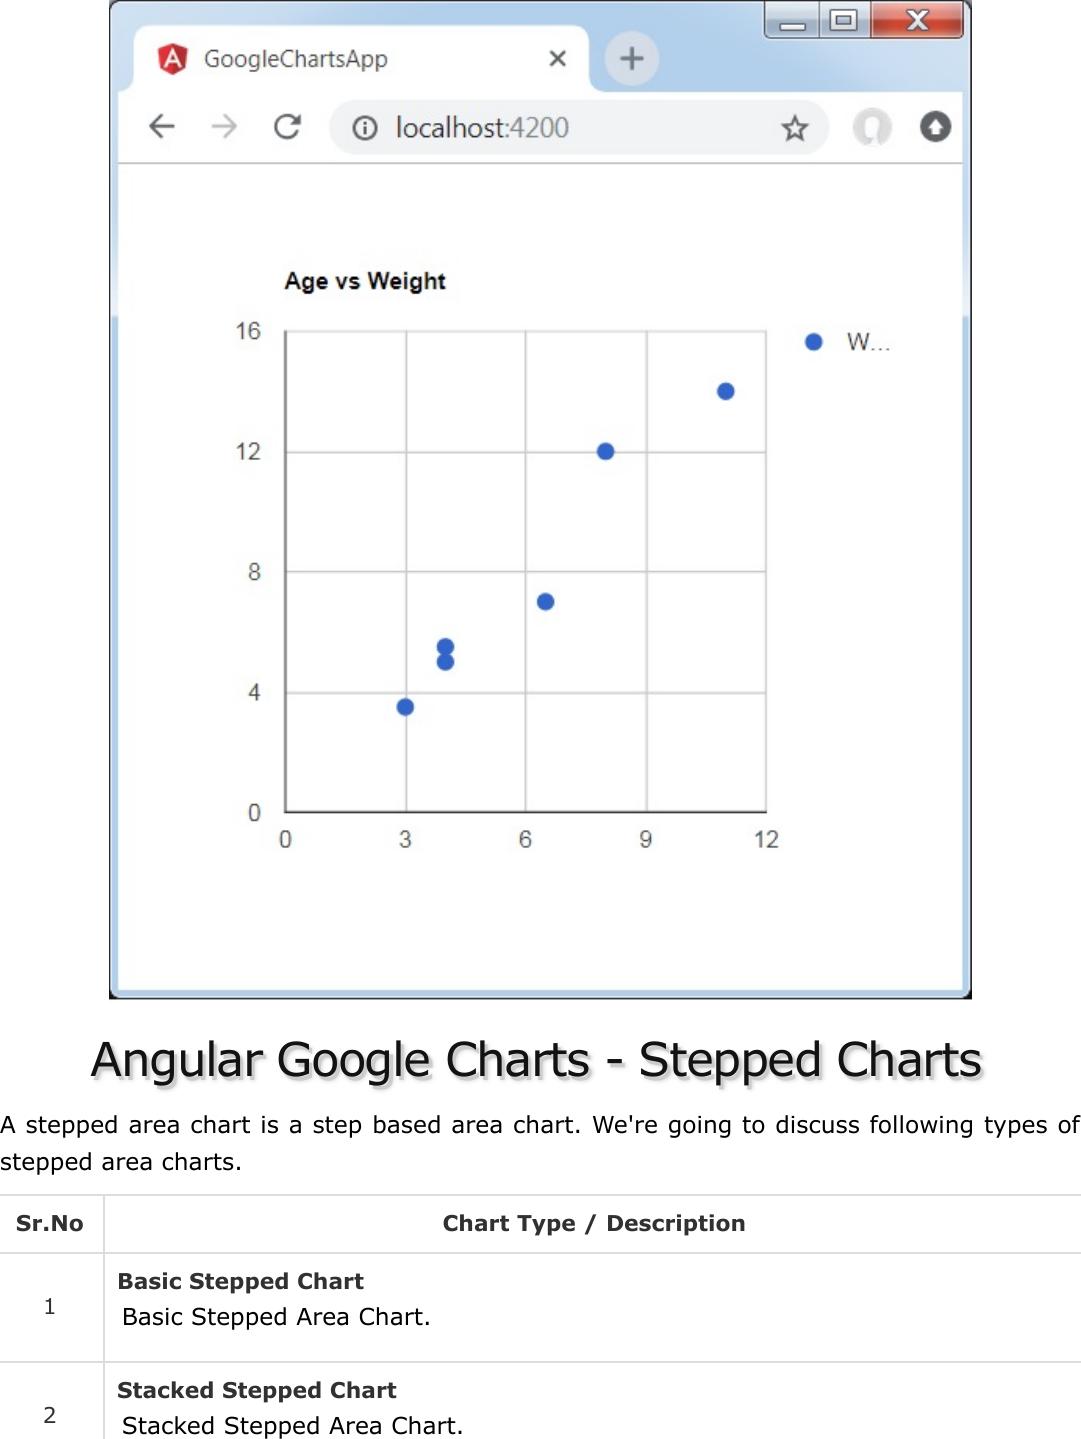 Angular Google Charts Quick Guide